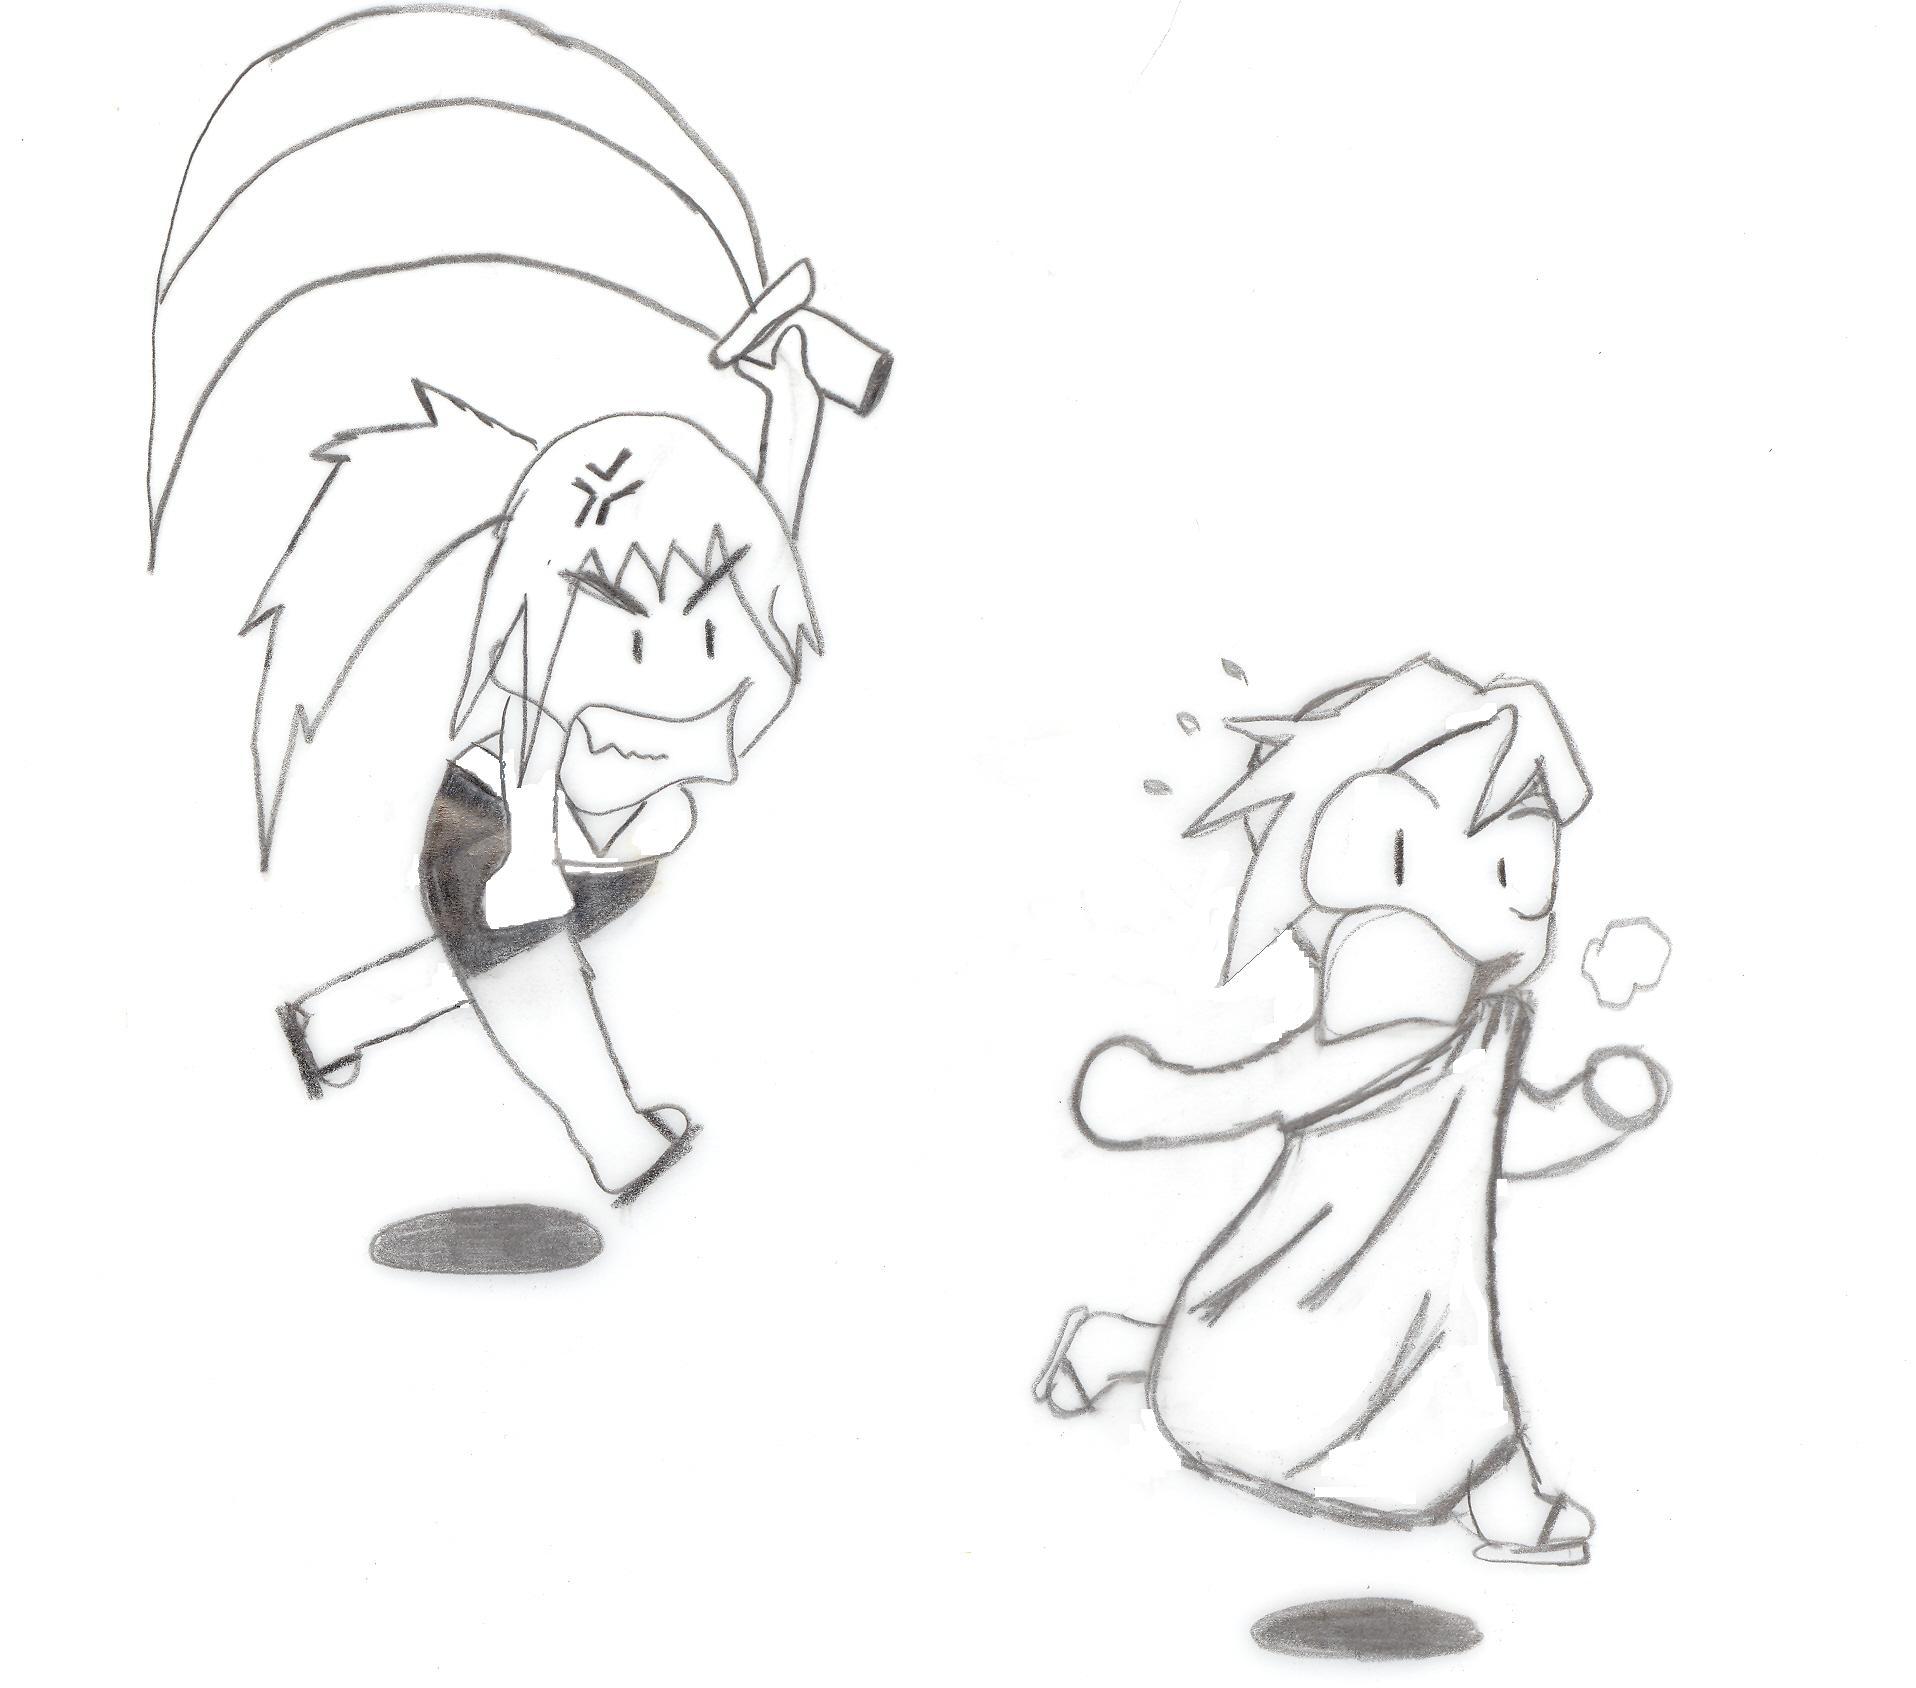 Daphne chasing Lysander